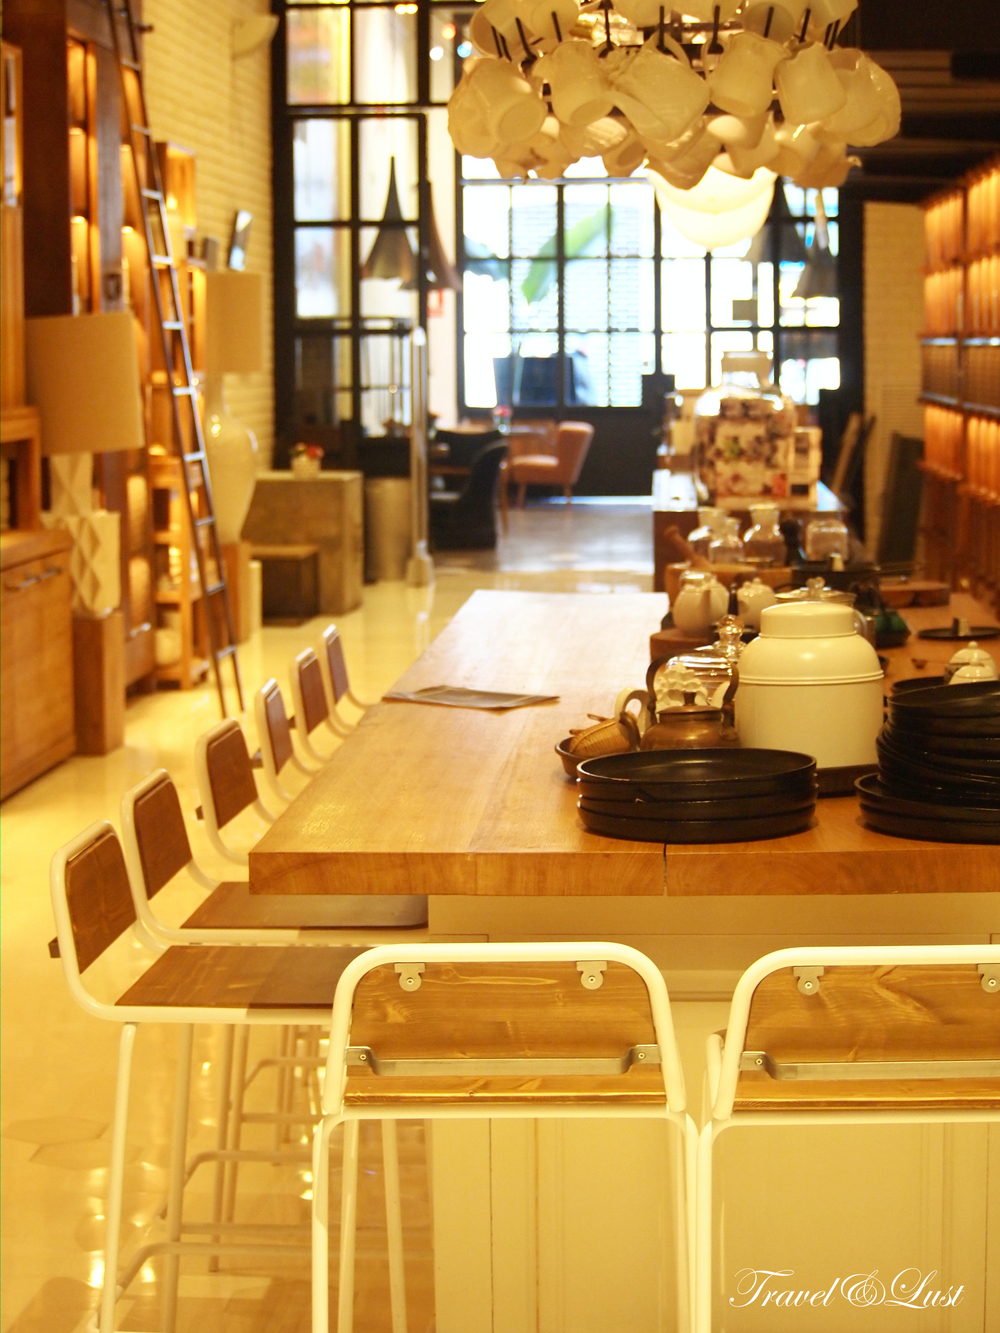 We love the wooden decorin the tea shop.